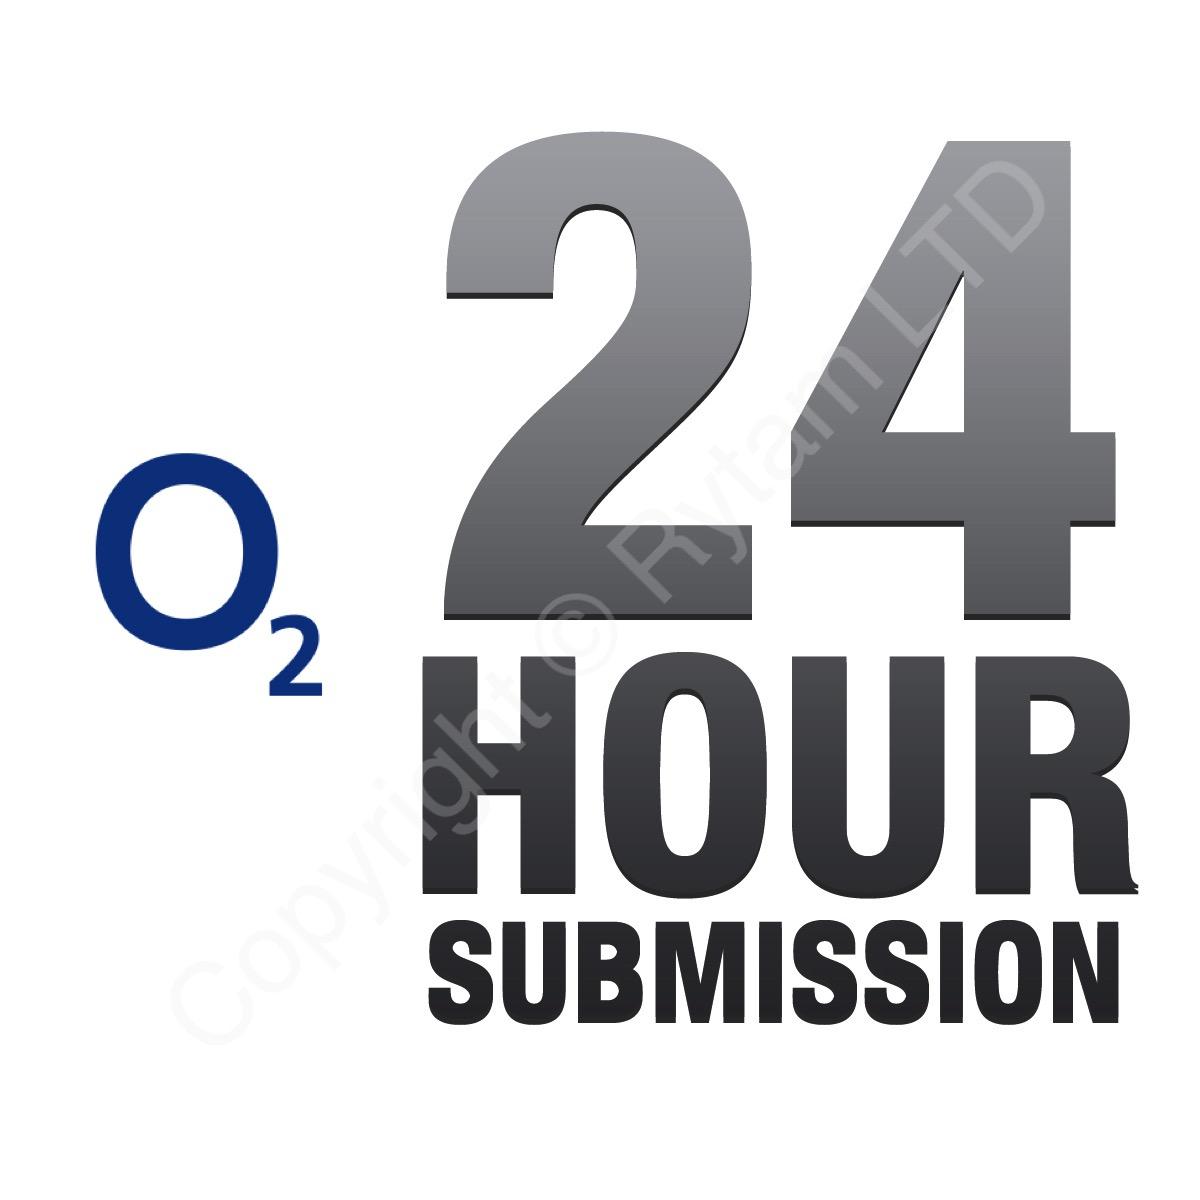 O2 UK - All Makes / Models Unlock Service